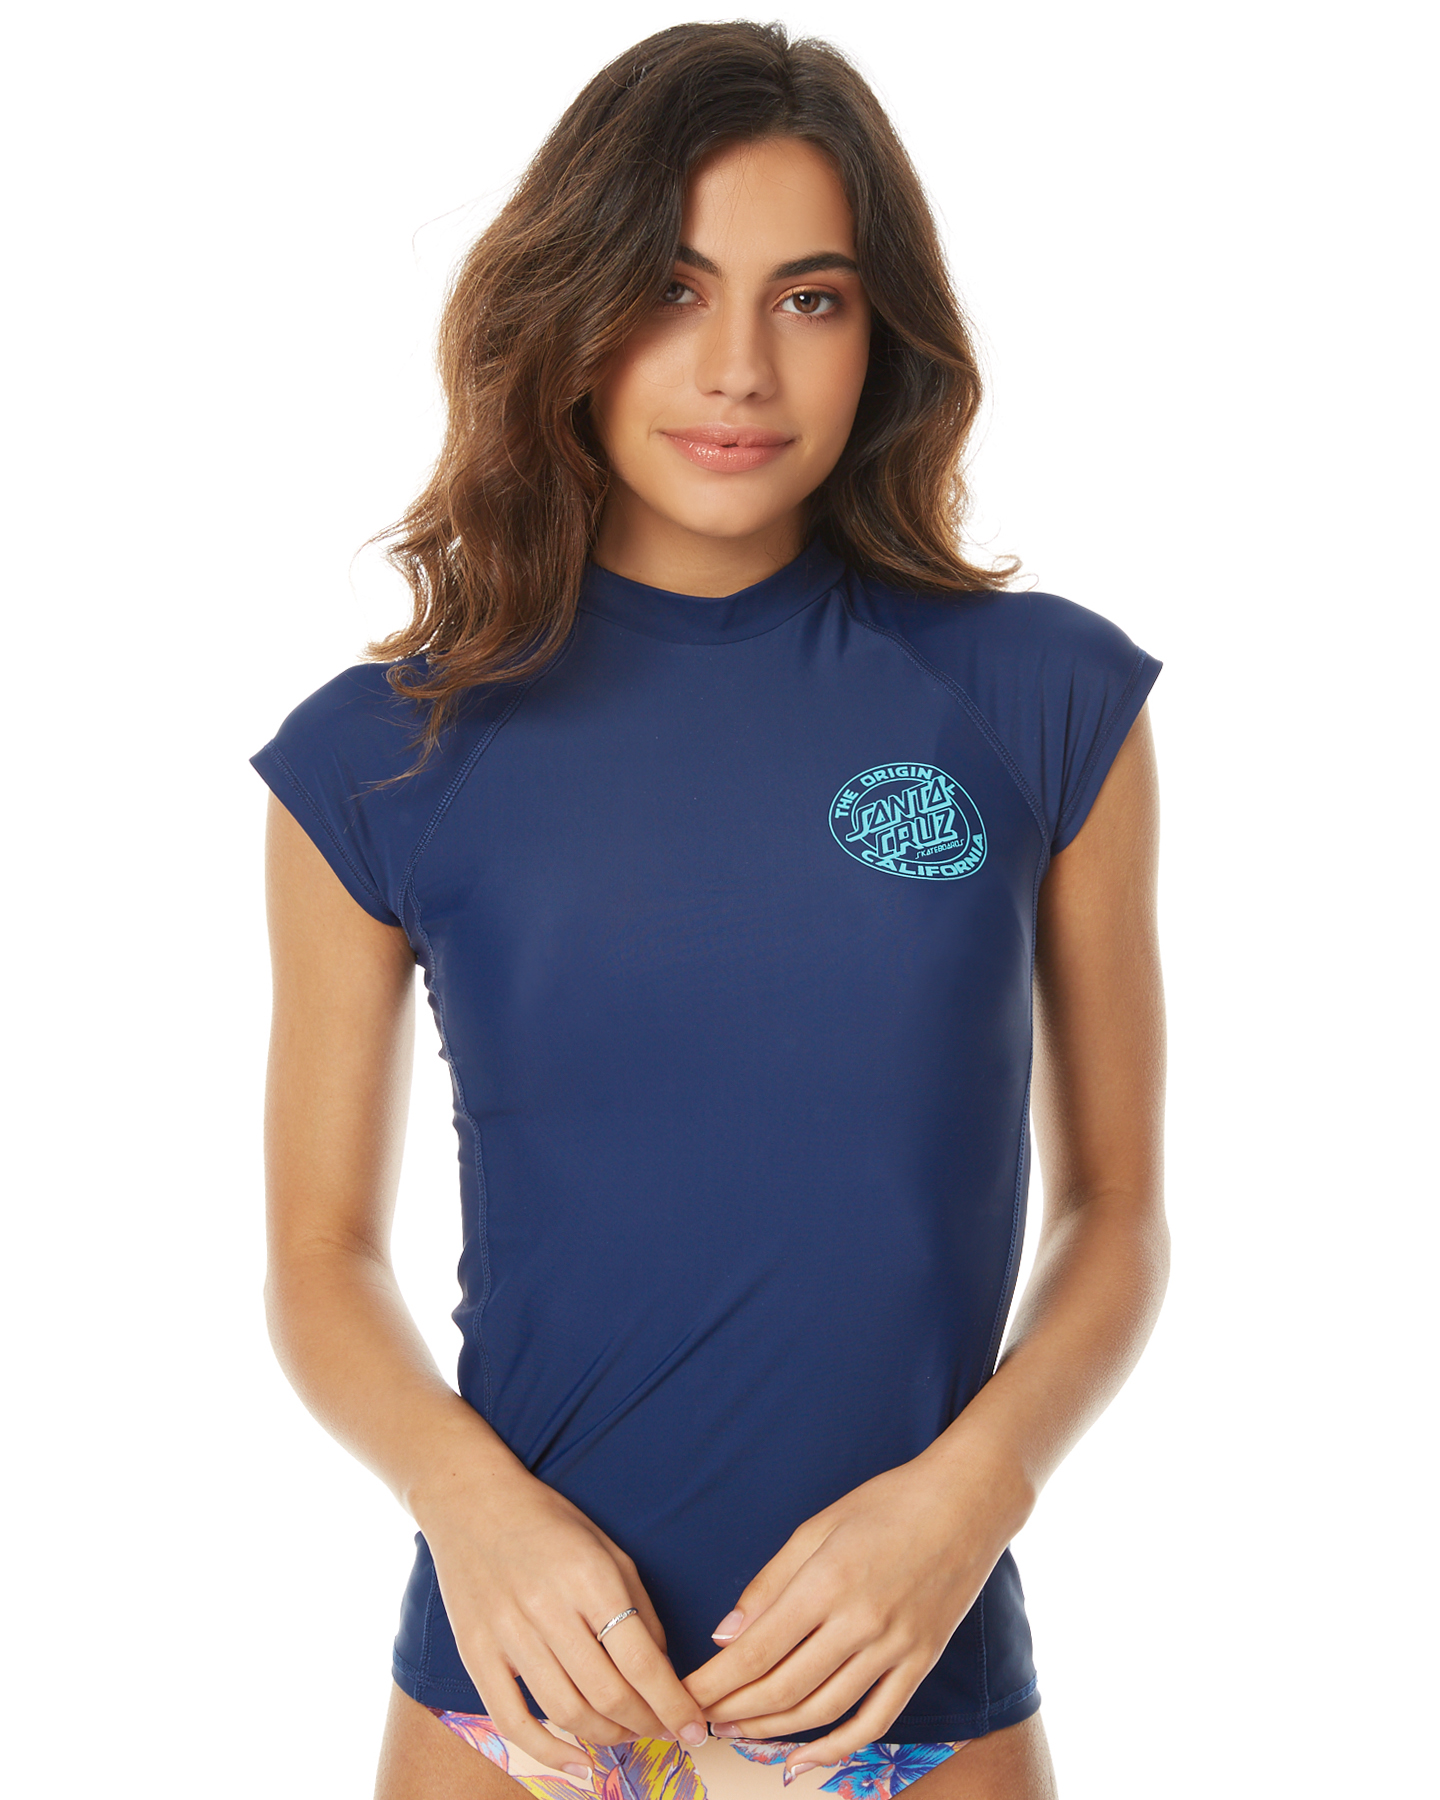 583f4f892a Santa Cruz Cali Dot Rash Vest - Atlantic Blue | SurfStitch